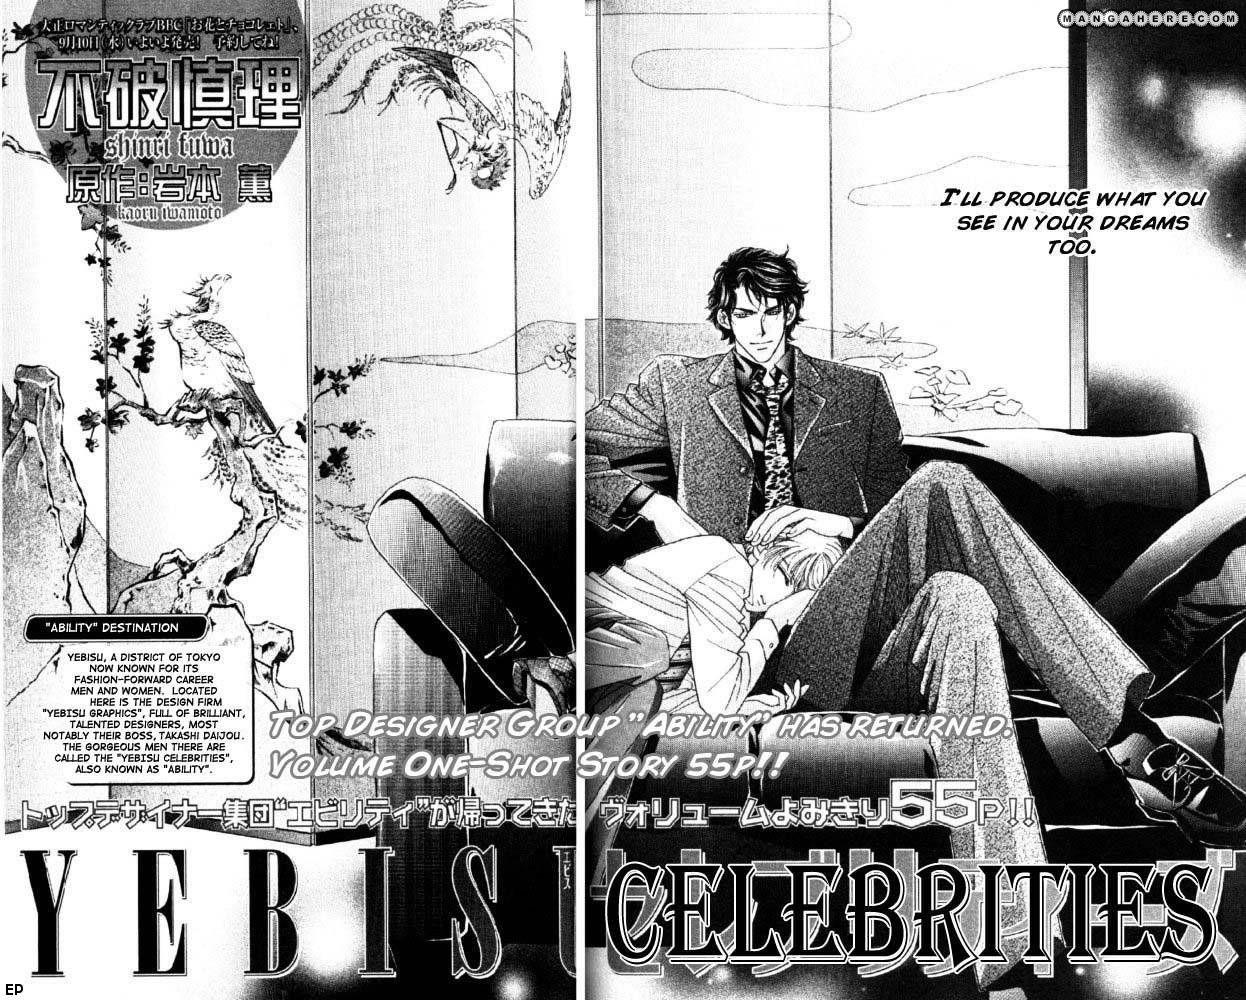 Yebisu Celebrities 2 Page 2